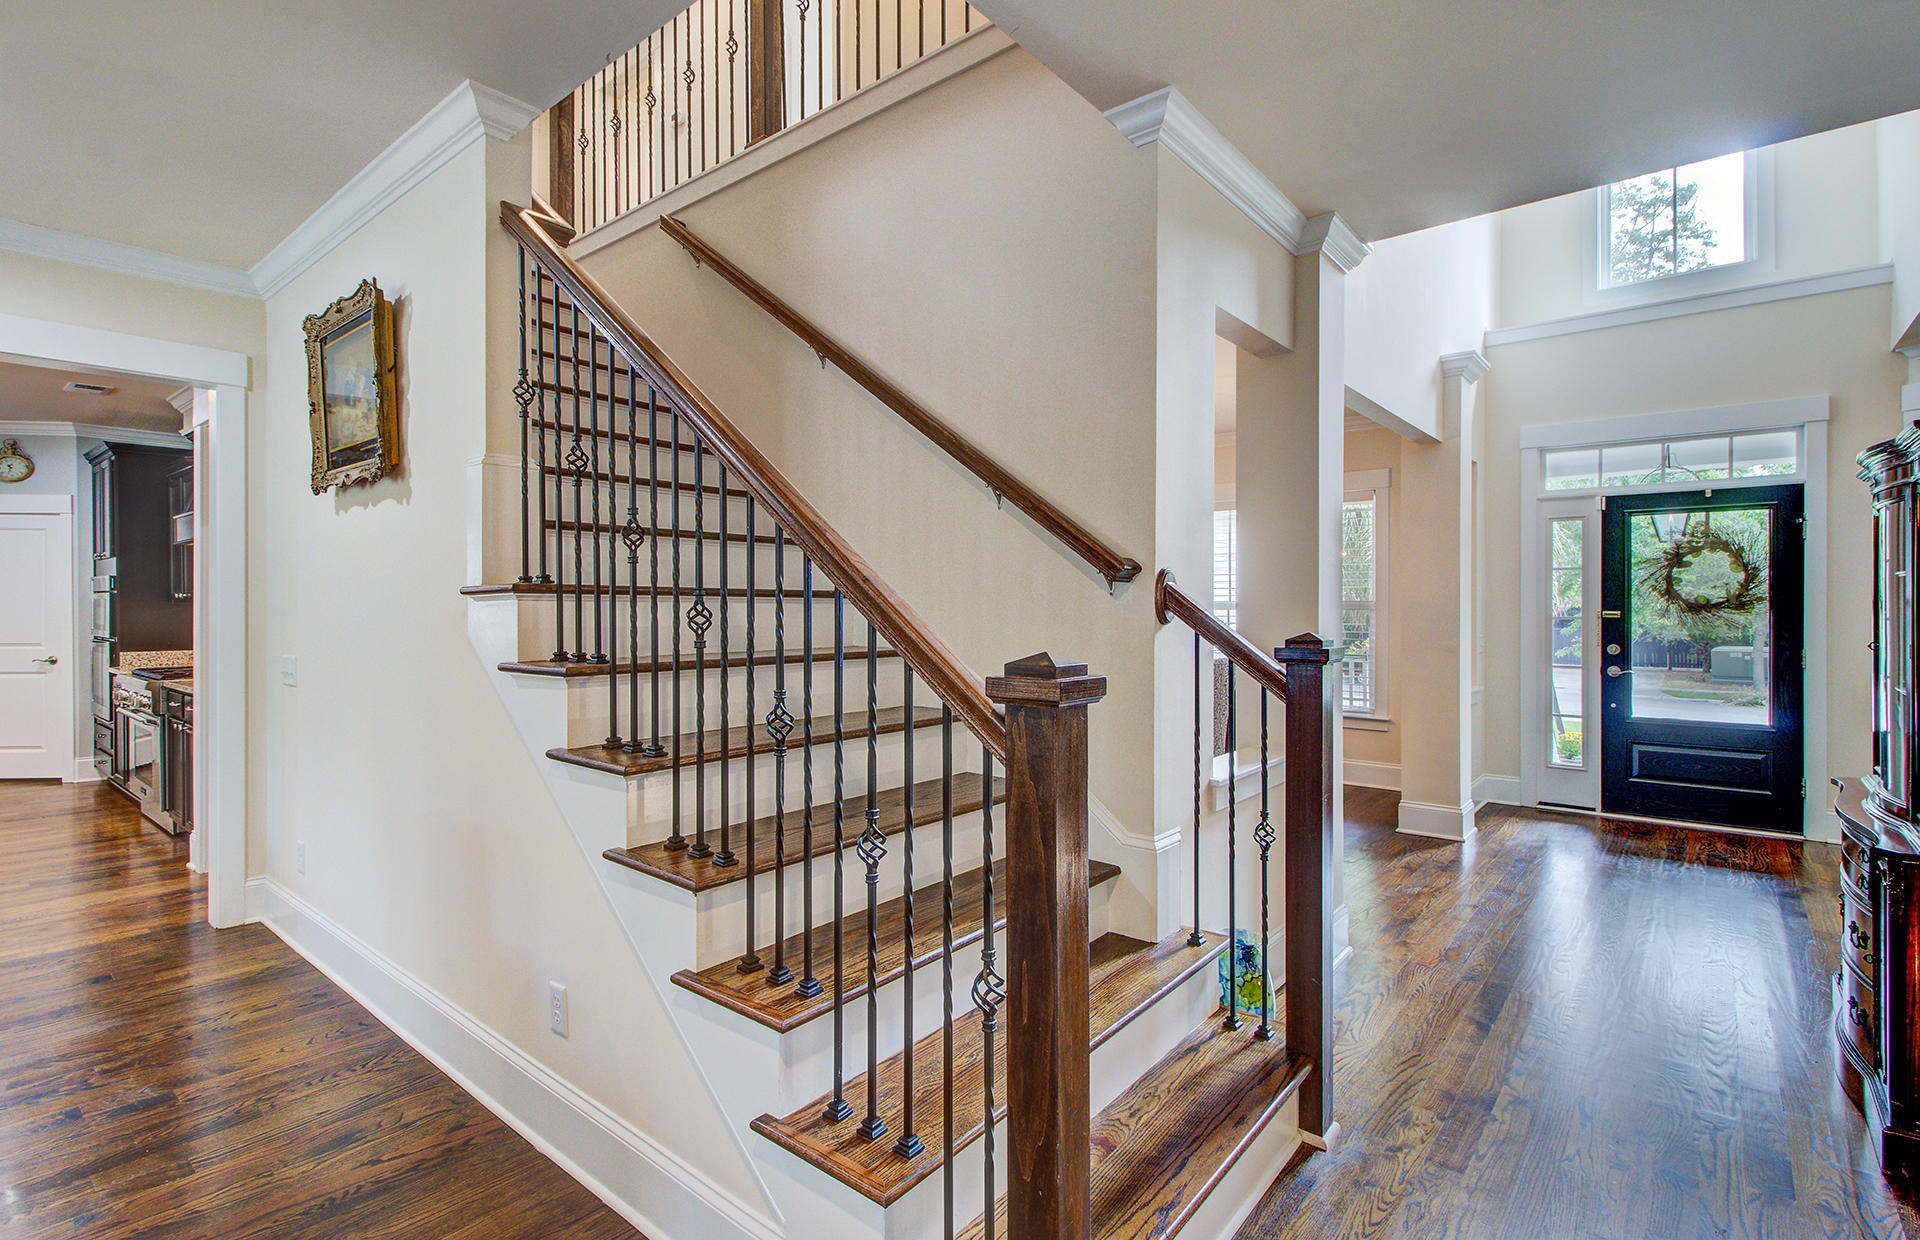 Scotts Creek Homes For Sale - 1404 Scotts Creek, Mount Pleasant, SC - 22